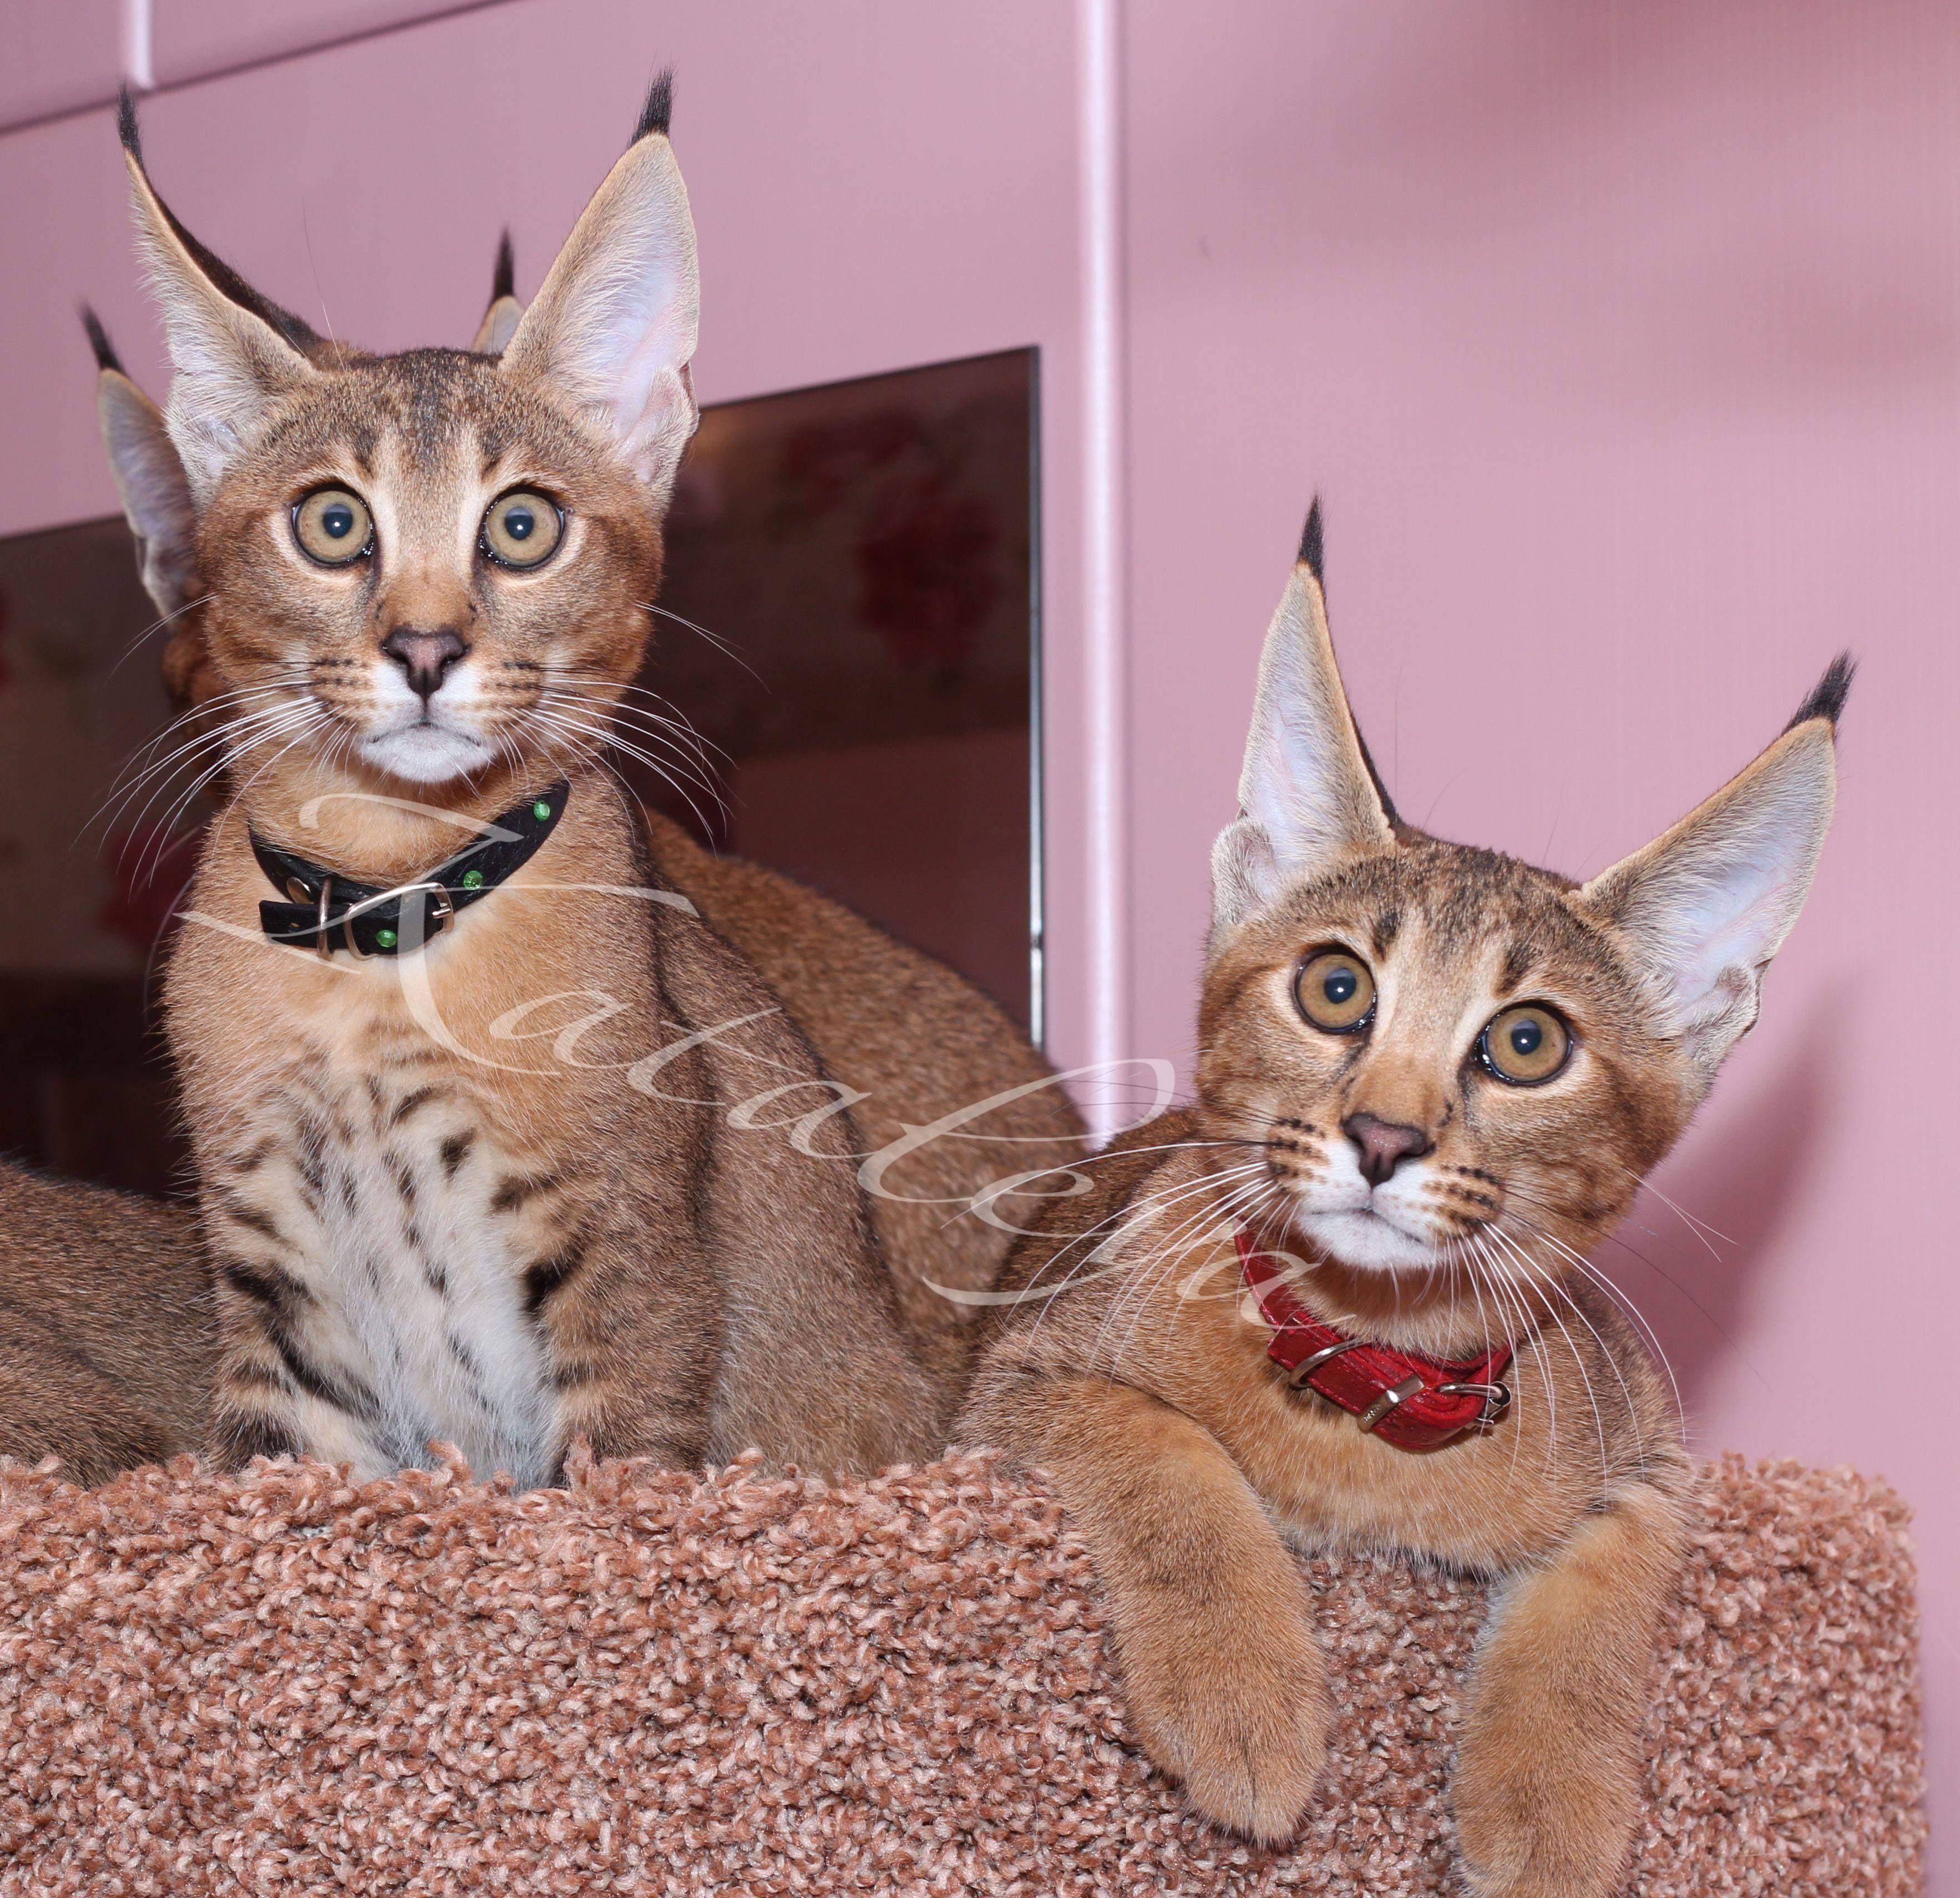 Корат: фото кошки, цена, описание породы, характер, видео, питомники